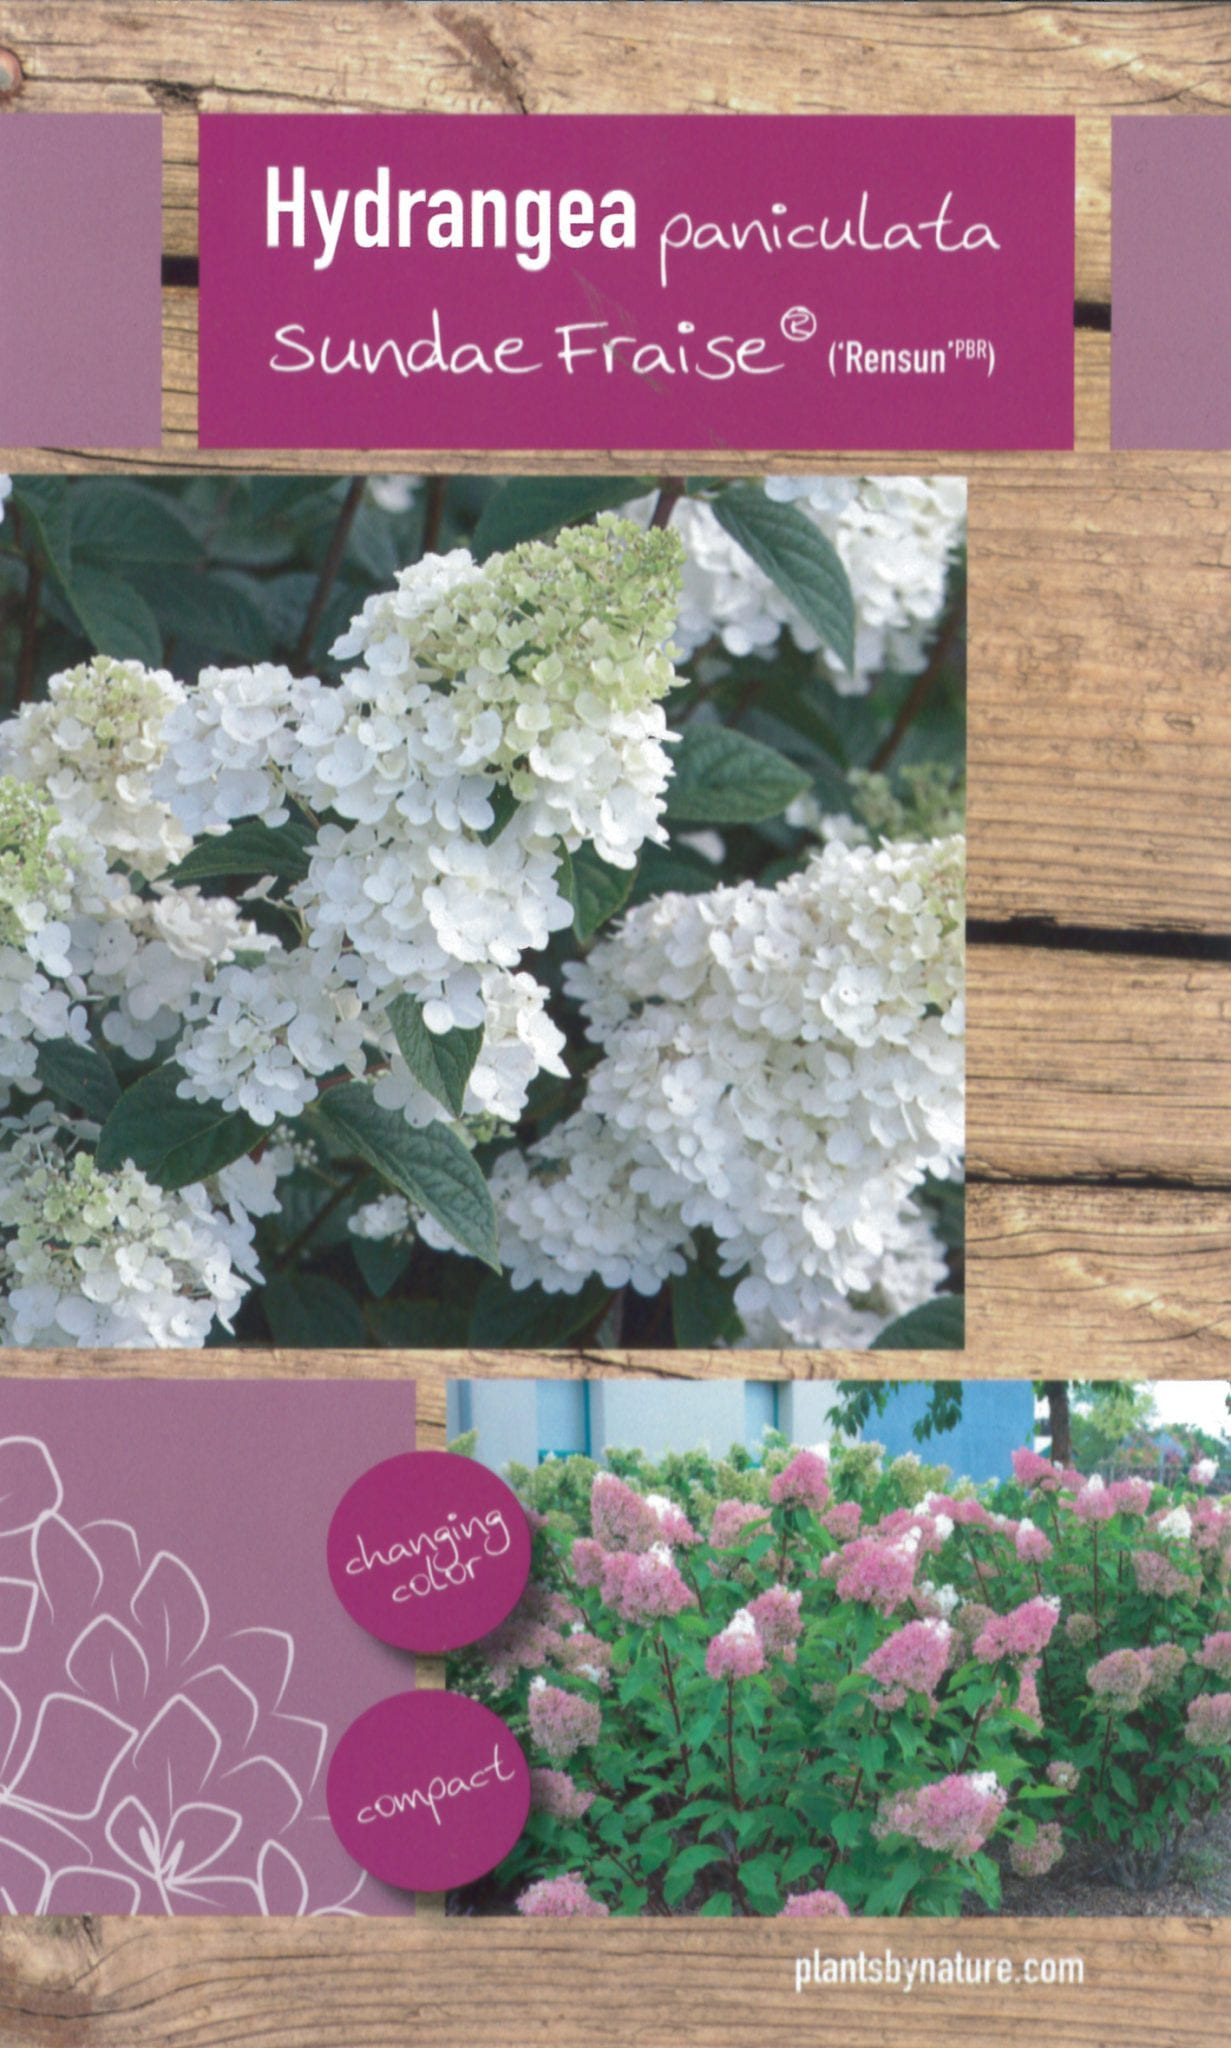 De Hydrangea paniculata 'Sundae Fraise (Rensun PBR)' etiket voorzijde | Plants By Nature - gespecialiseerd in hydrangea